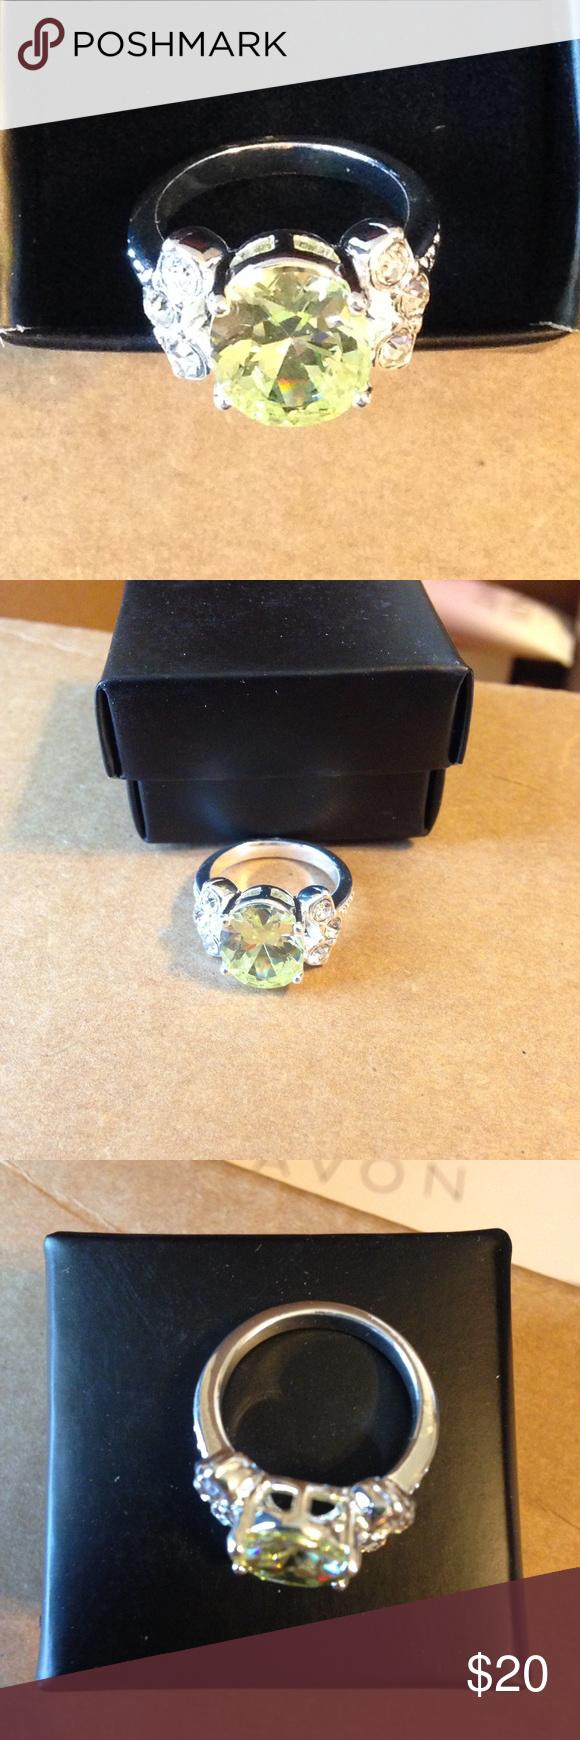 Elegant lady  ring Apple Green size 6 Avon Avon elegant lady cz ring Apple green size 6 new Avon Jewelry Rings